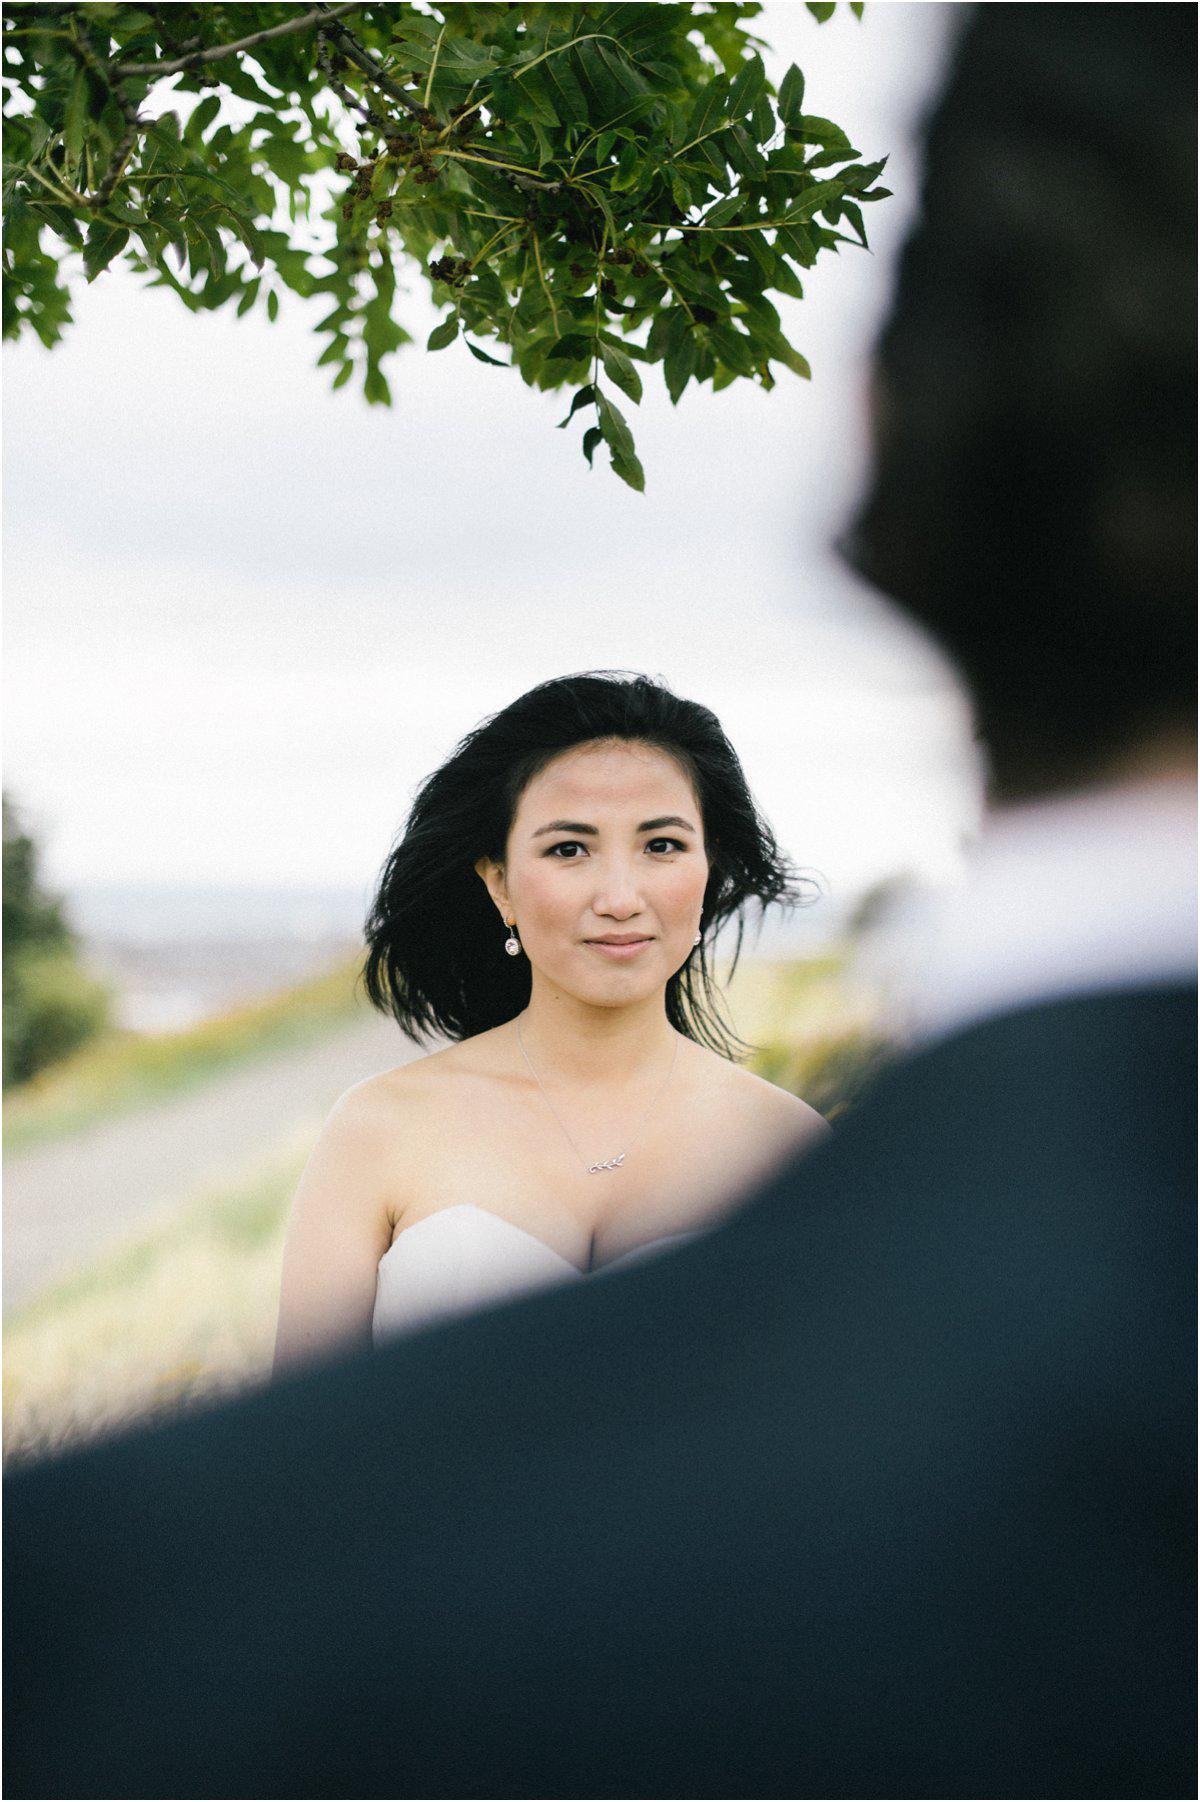 Crofts & Kowalczyk Best Wedding Photography Scotland Blogpost-92.jpg